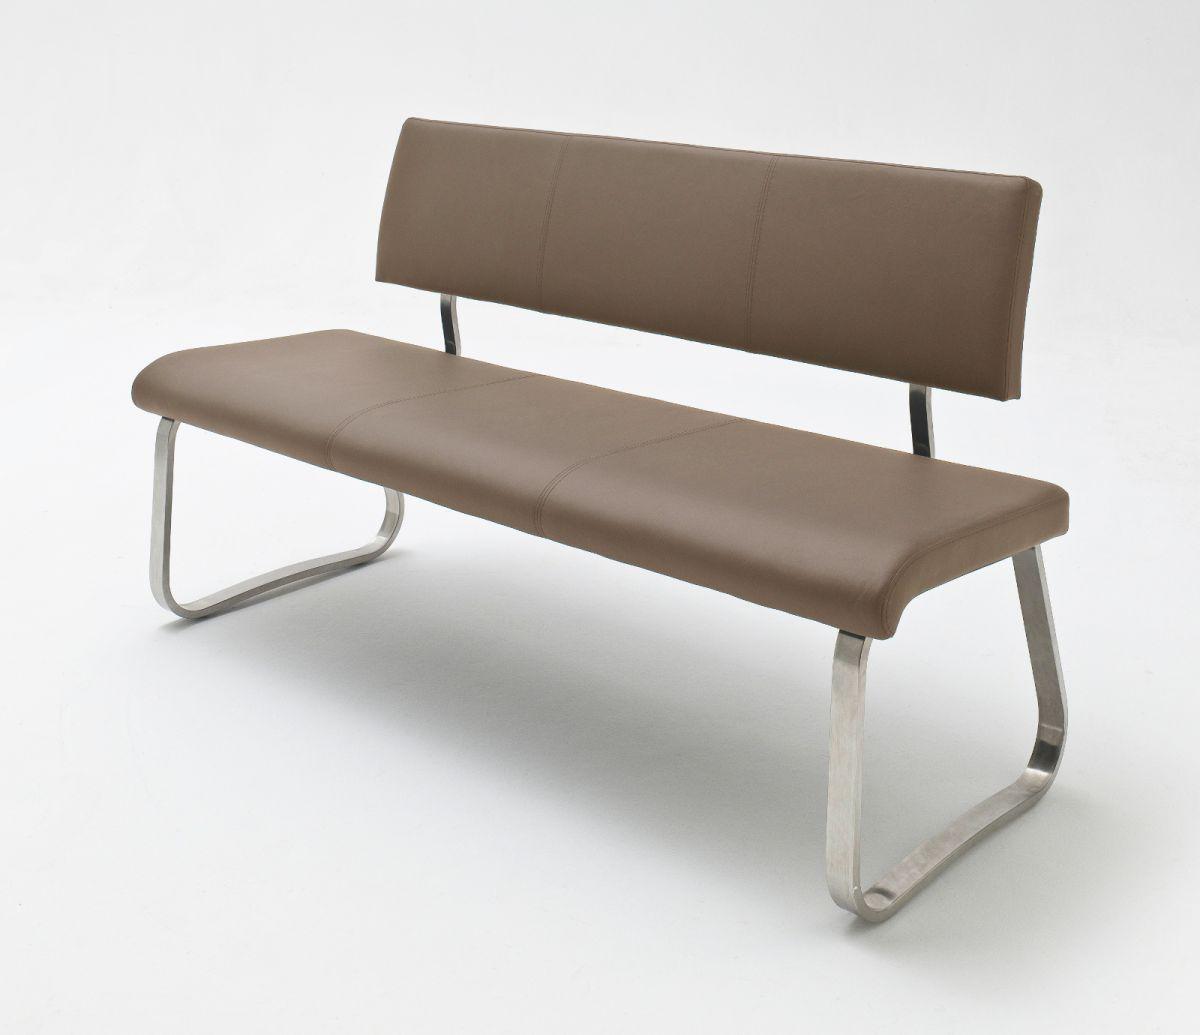 Sitzbank Arco Cappuccino Leder 155 cm